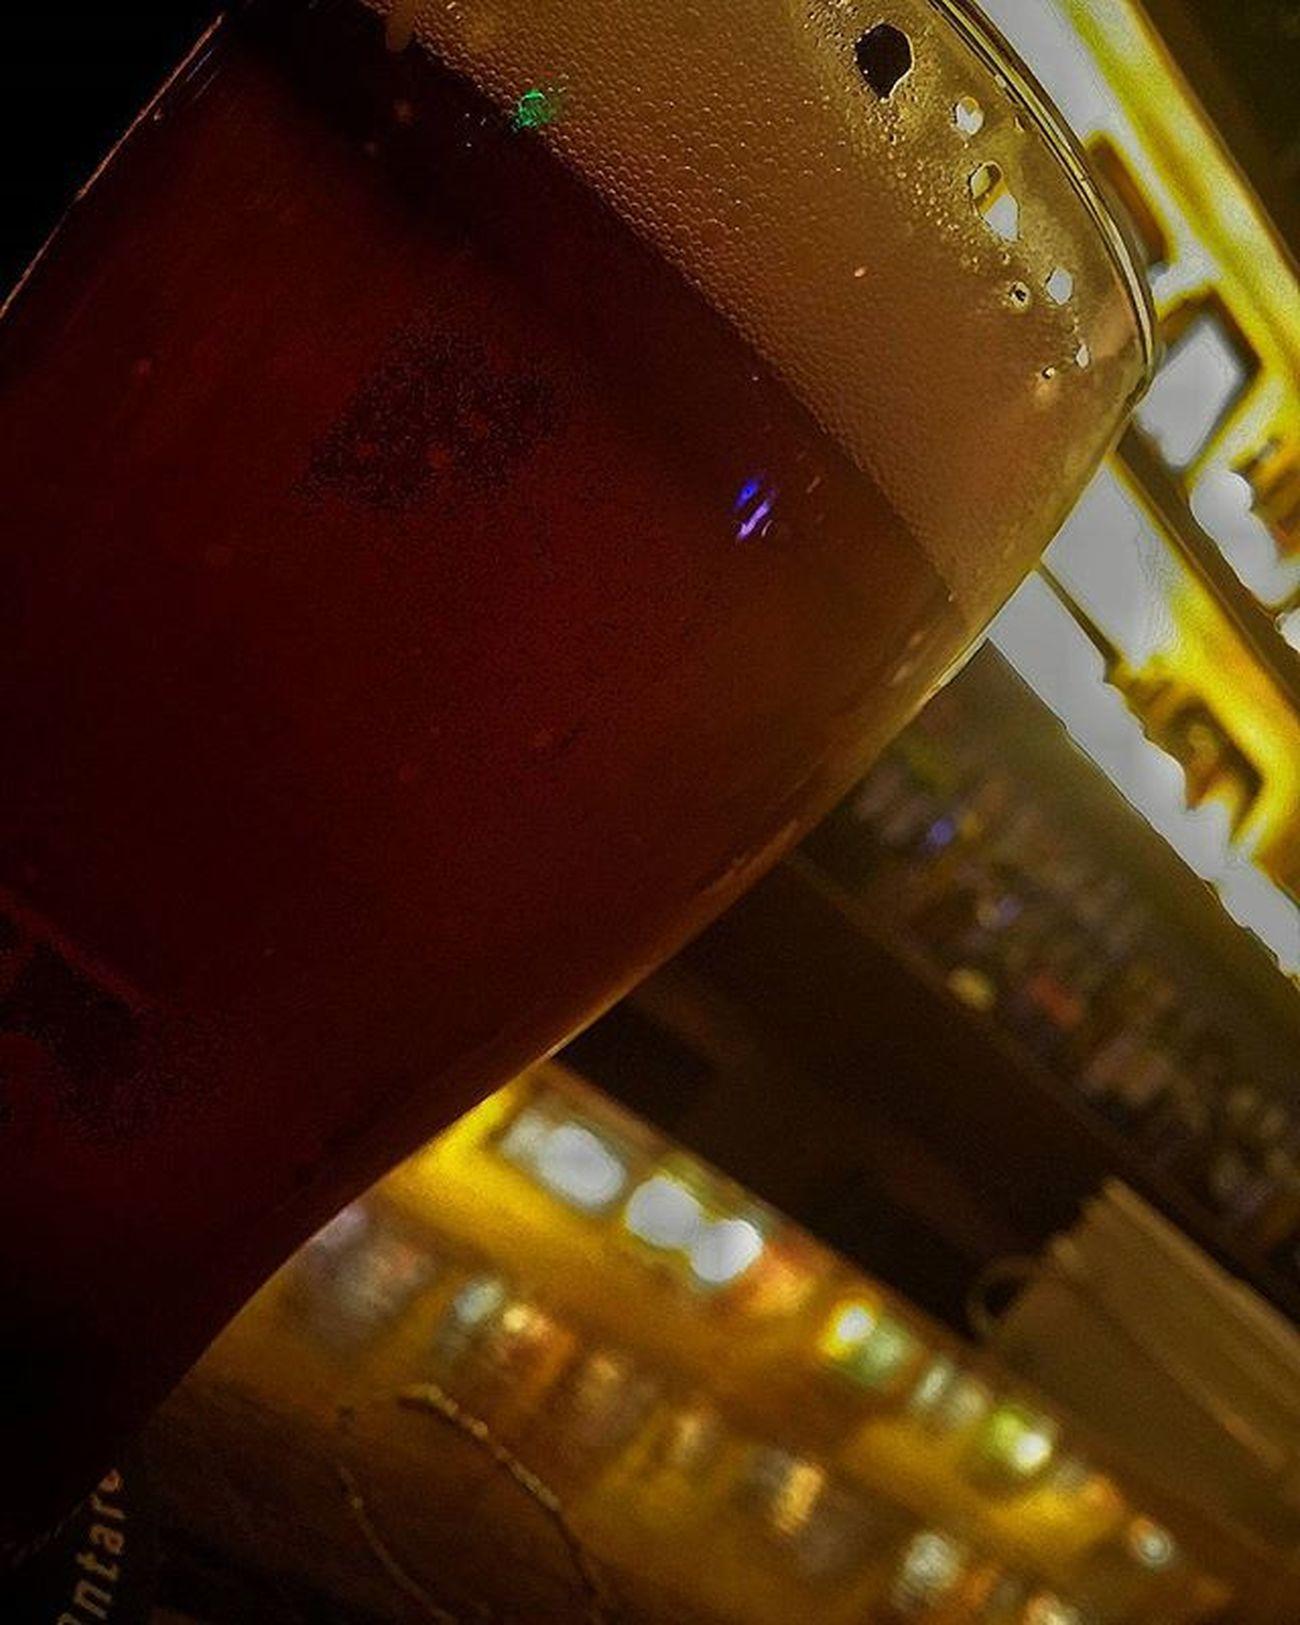 Goodnight GutenNacht Bonnenuit Buenasnoches Argentina Bsas Buenosaires Bahiablanca Beer Bier Bière Igrs IgrsArgentina IgrsBsAs Instagram Instapic Instagood Instalike Instamoment Instacool Igers Igersargentina Igersbsas